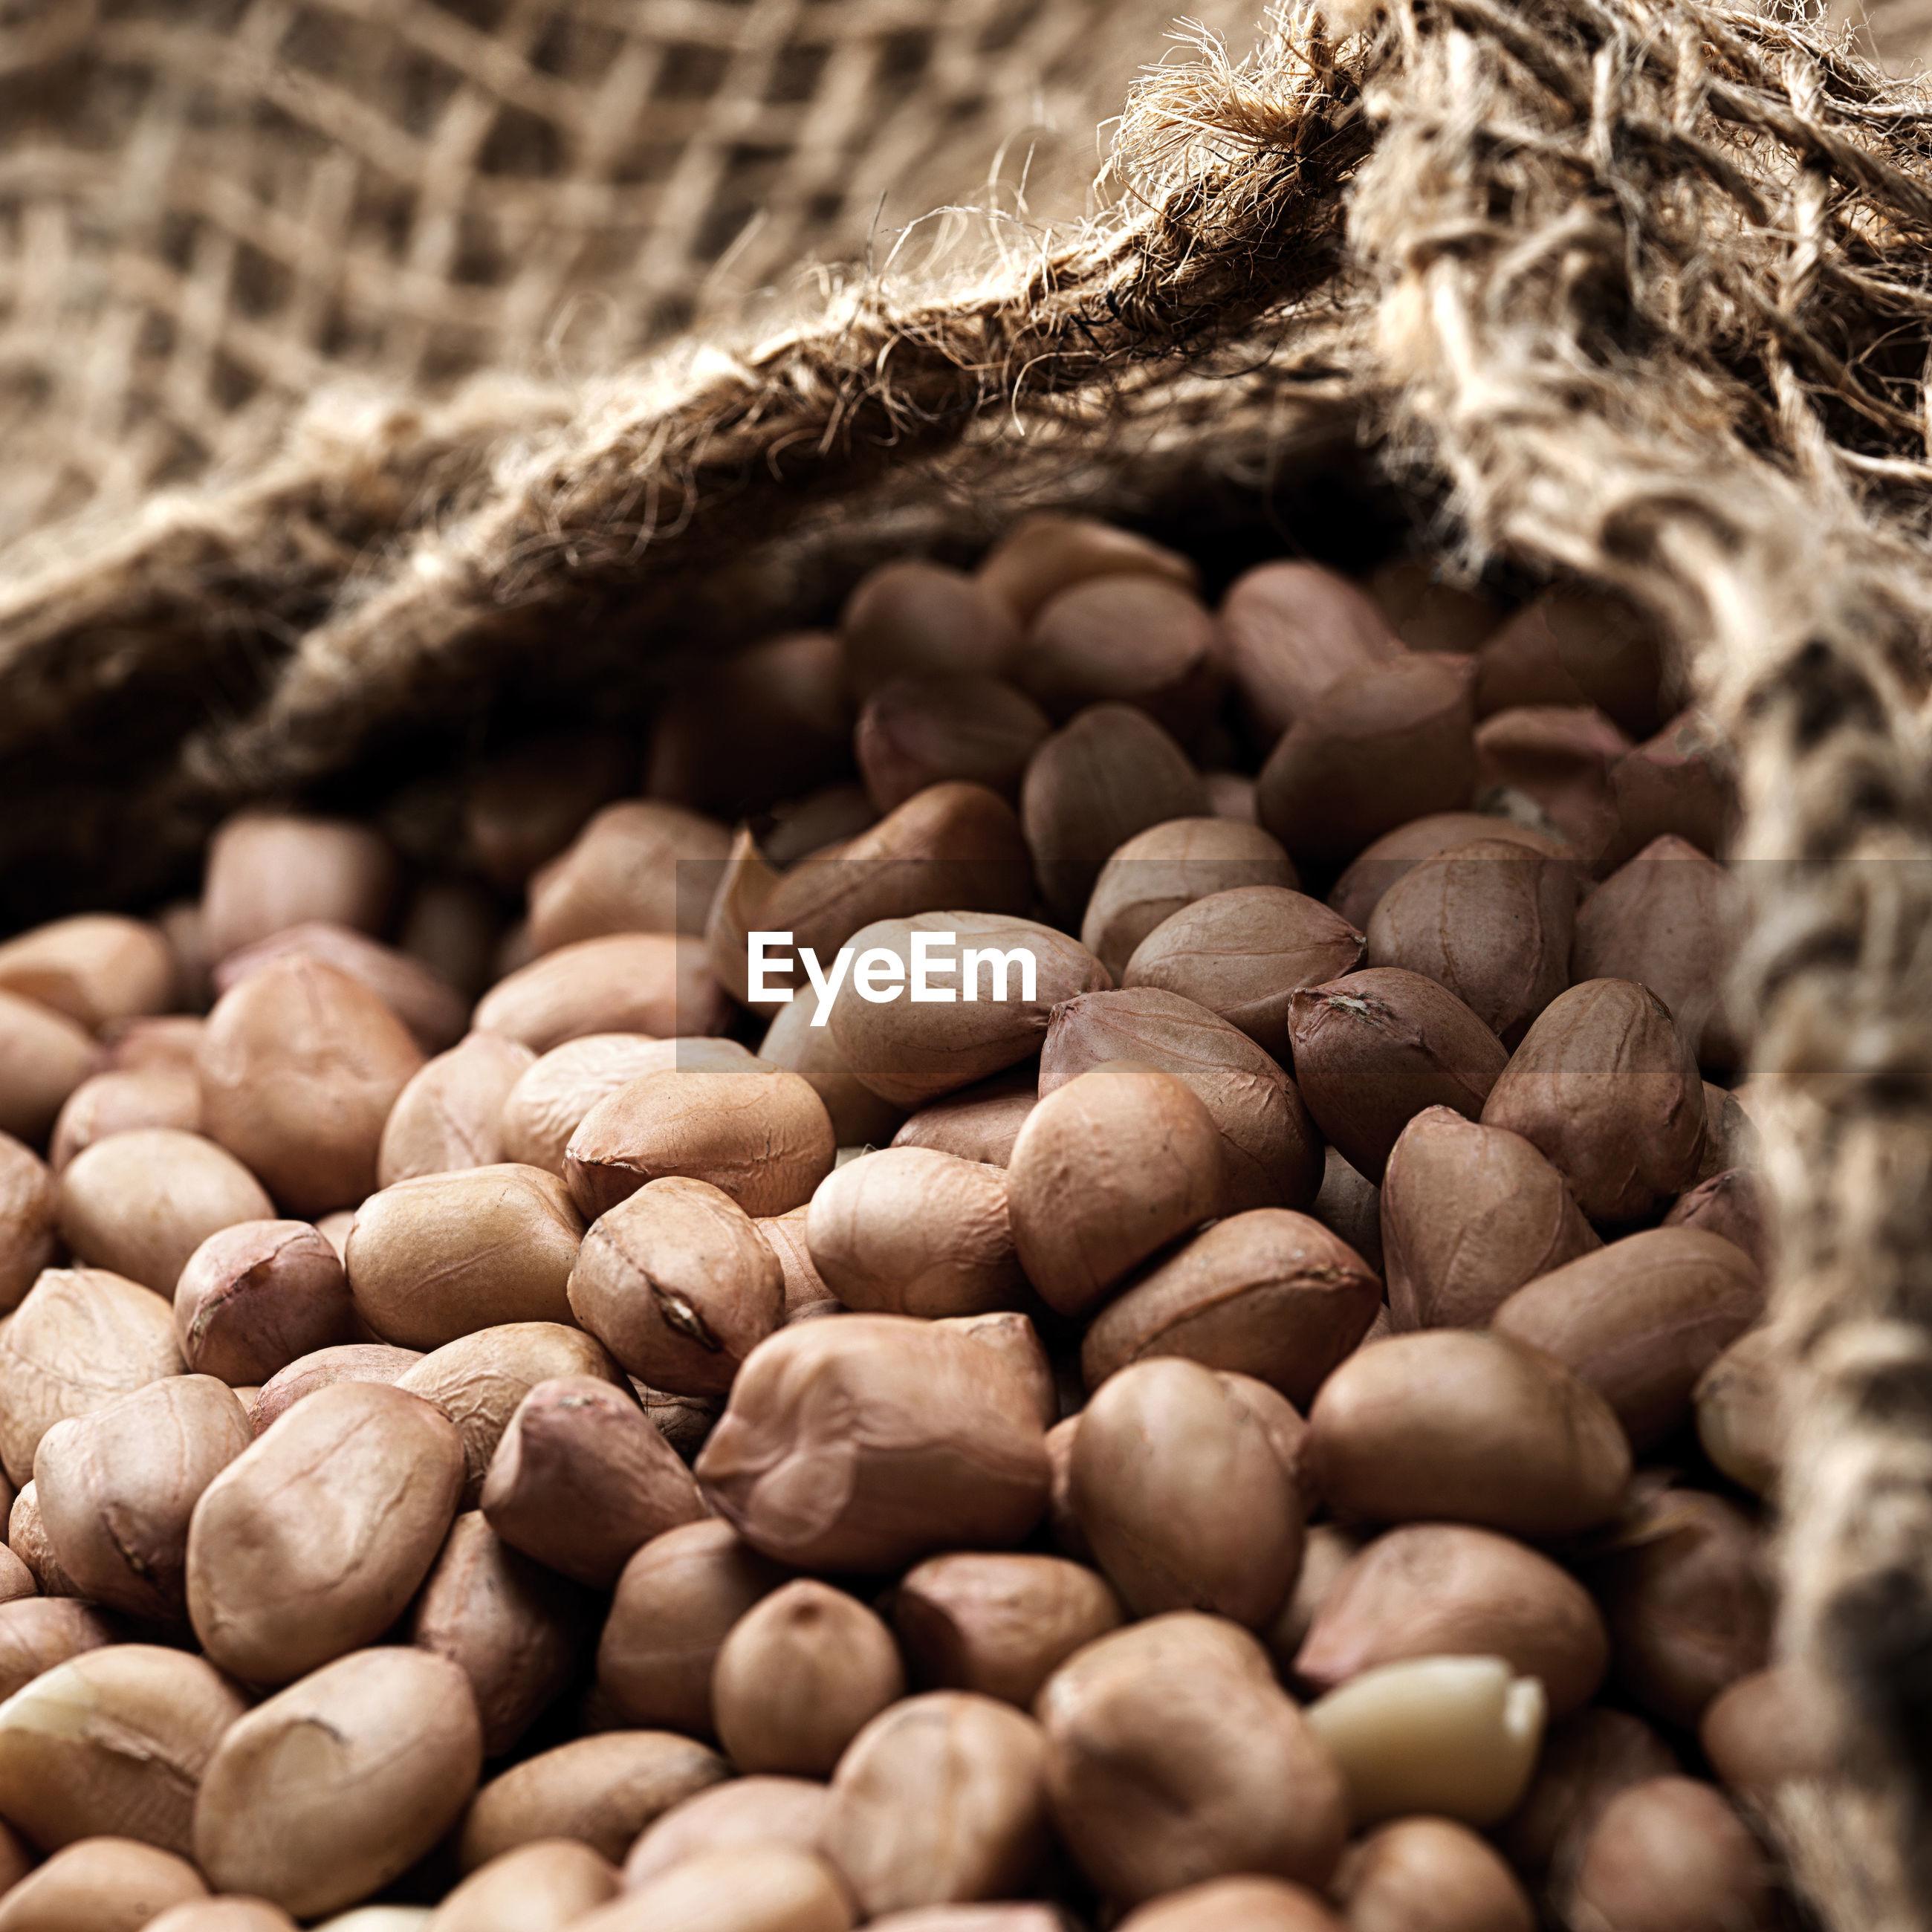 Close-up of peanuts in jute sack